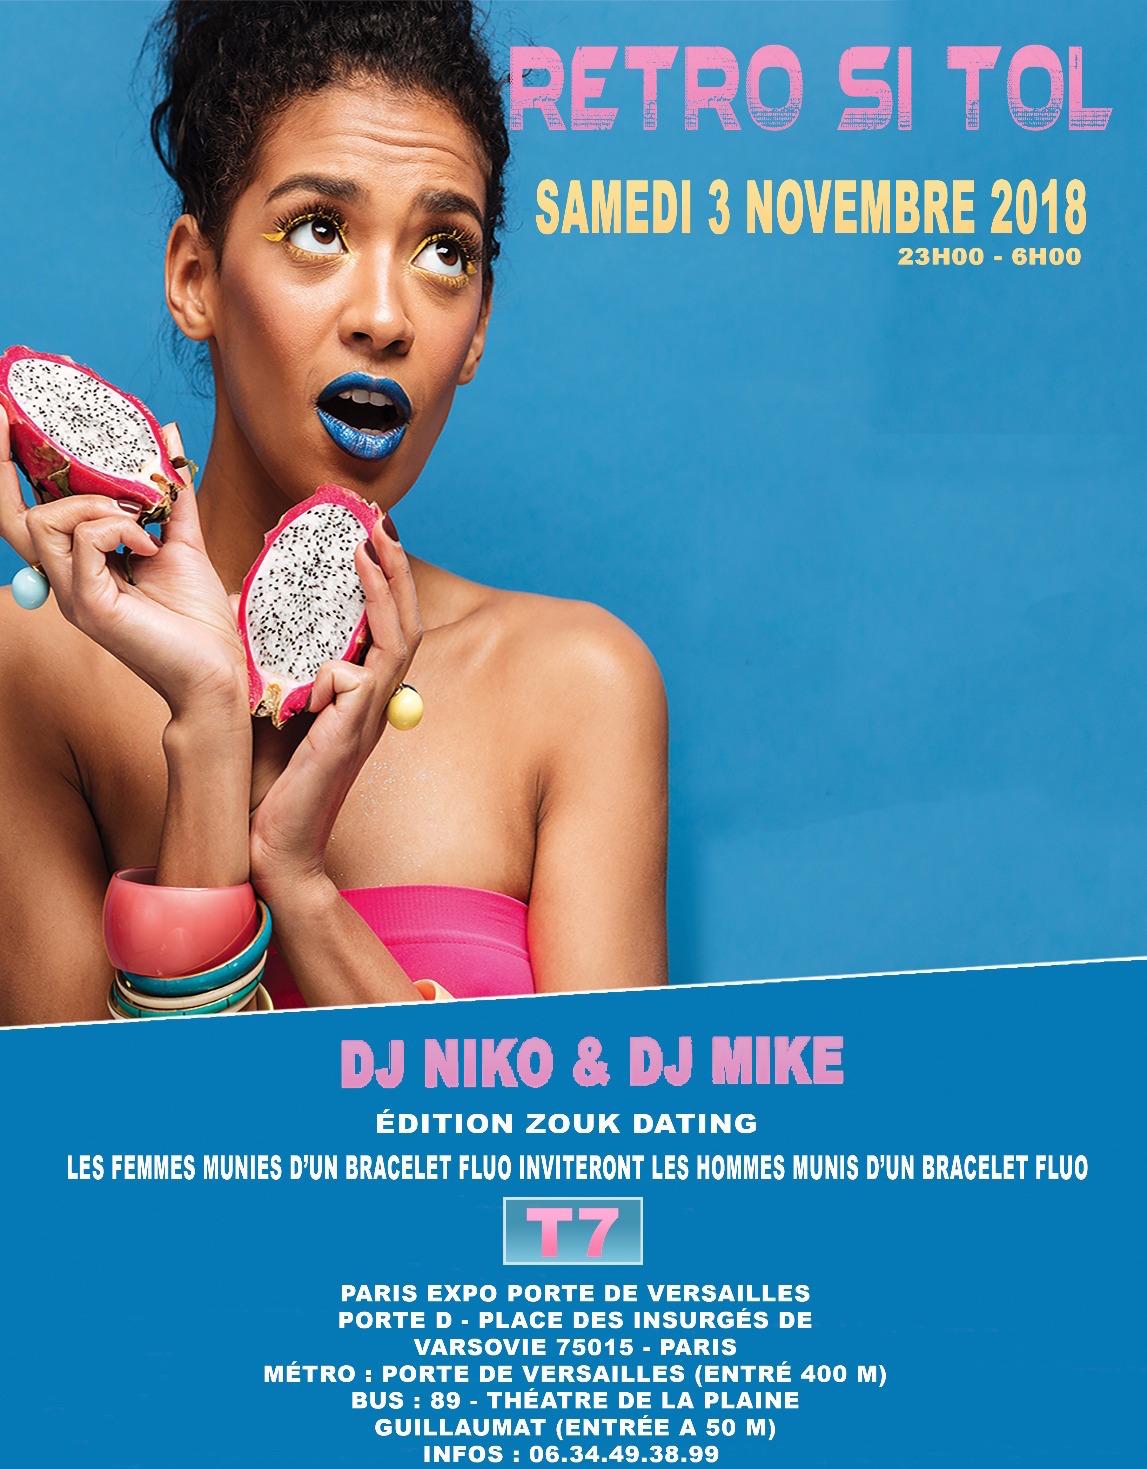 RÉTRO SI TOL EDITION ZOUK DATING AU T7 DJ NIKO & DJ MIKE